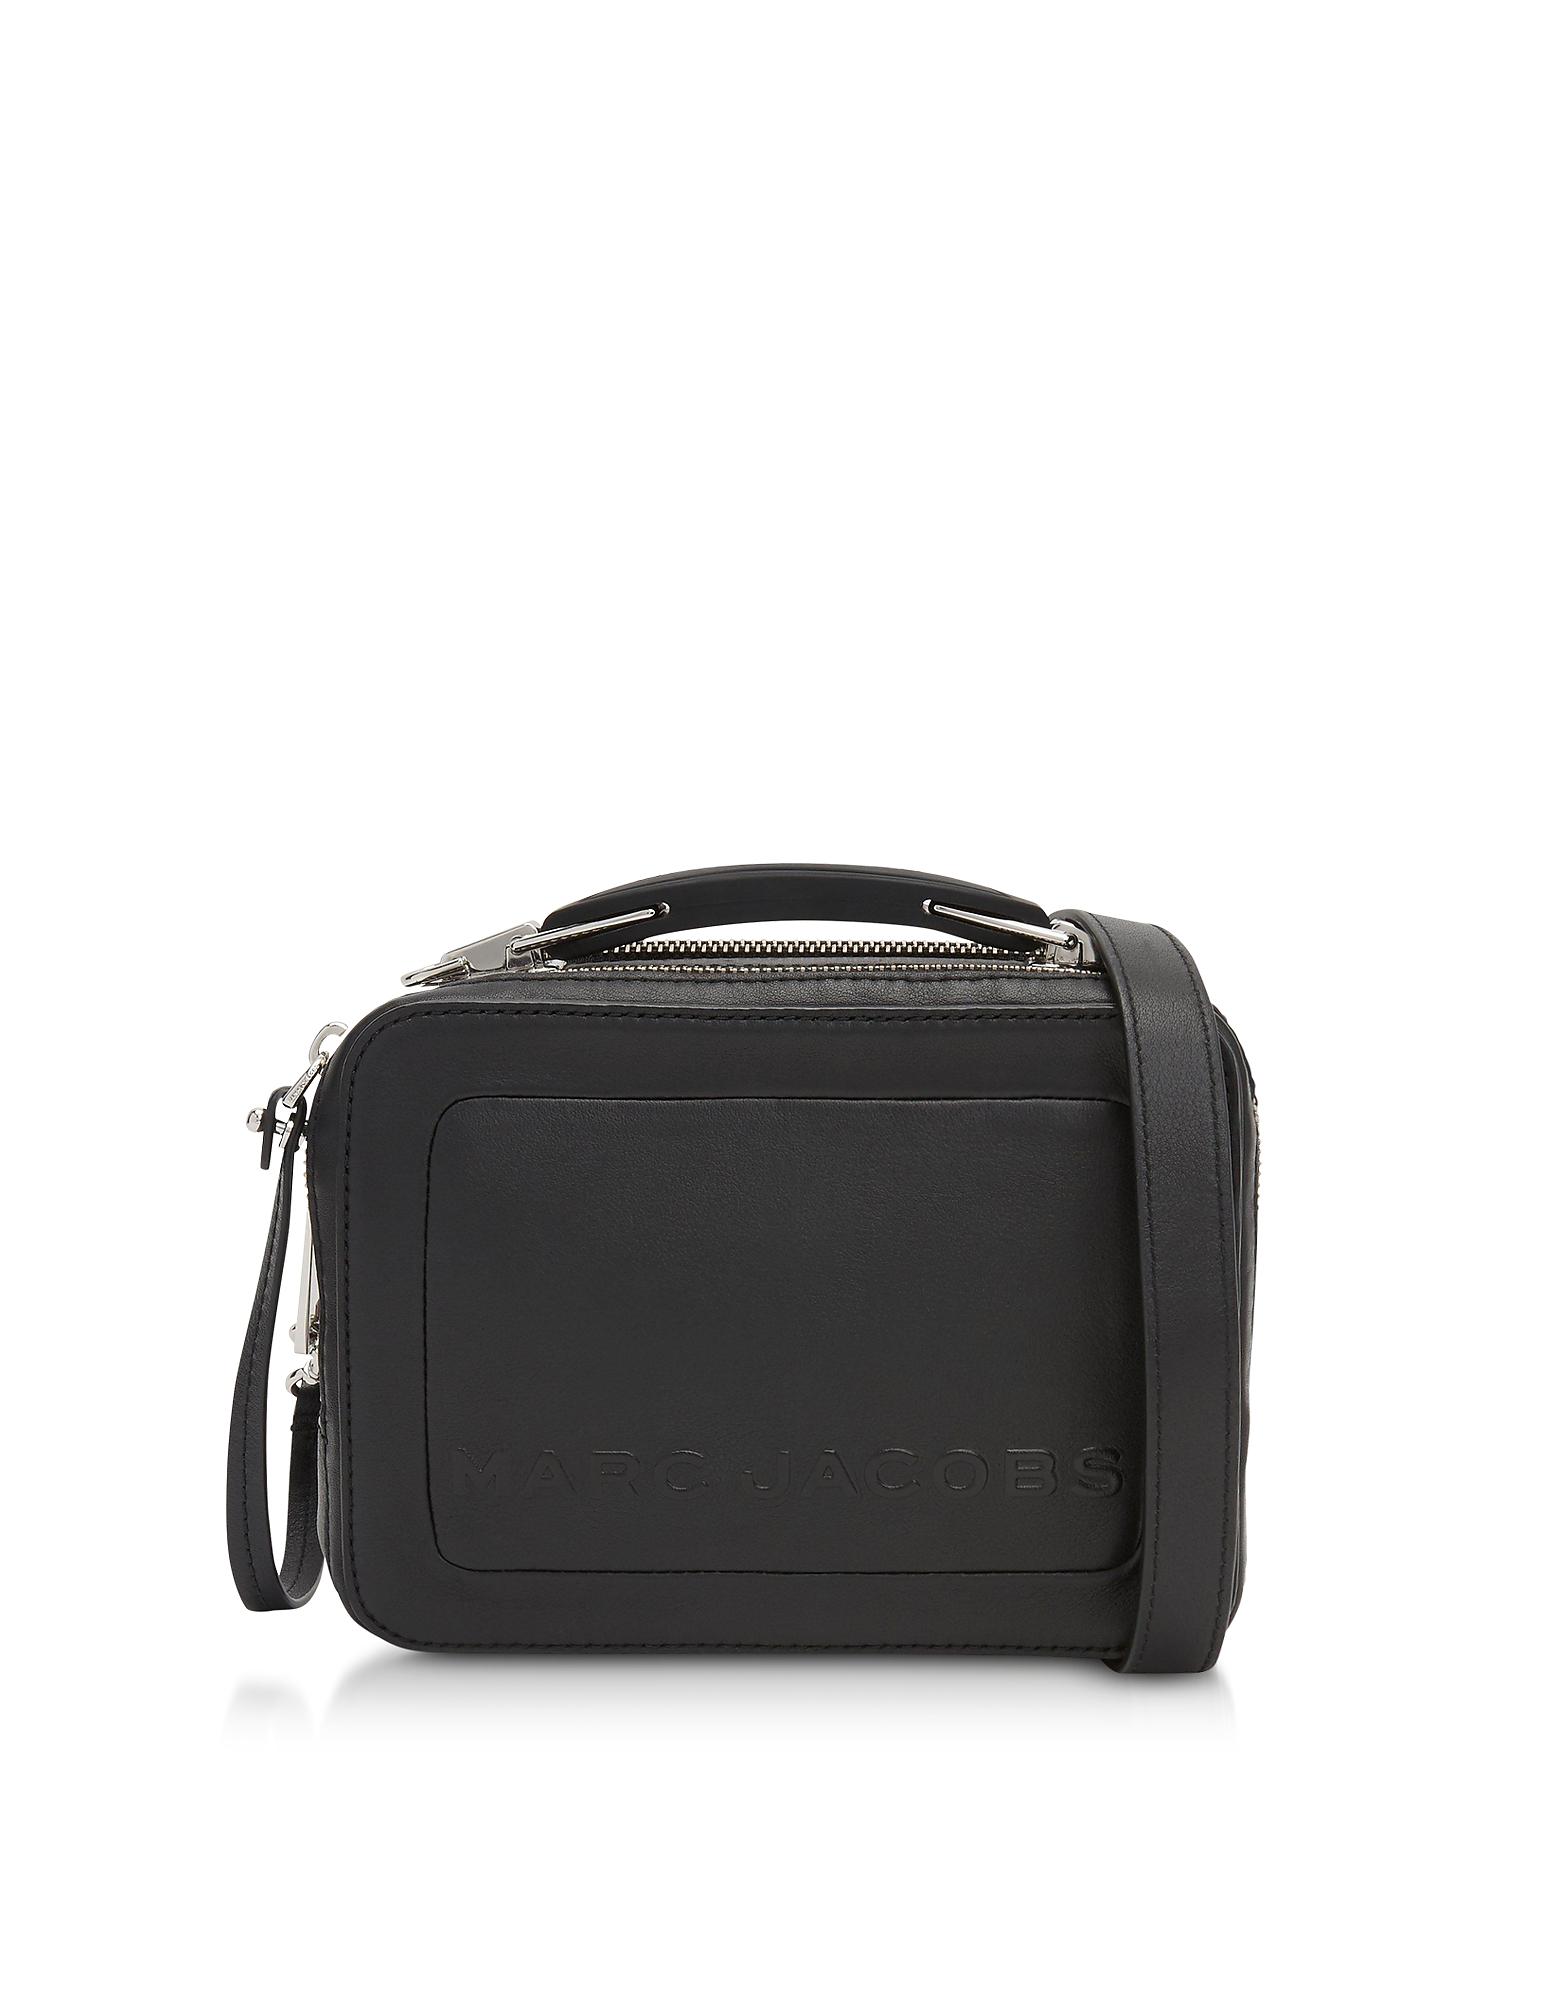 The Mini Box 20 Satchel Bag